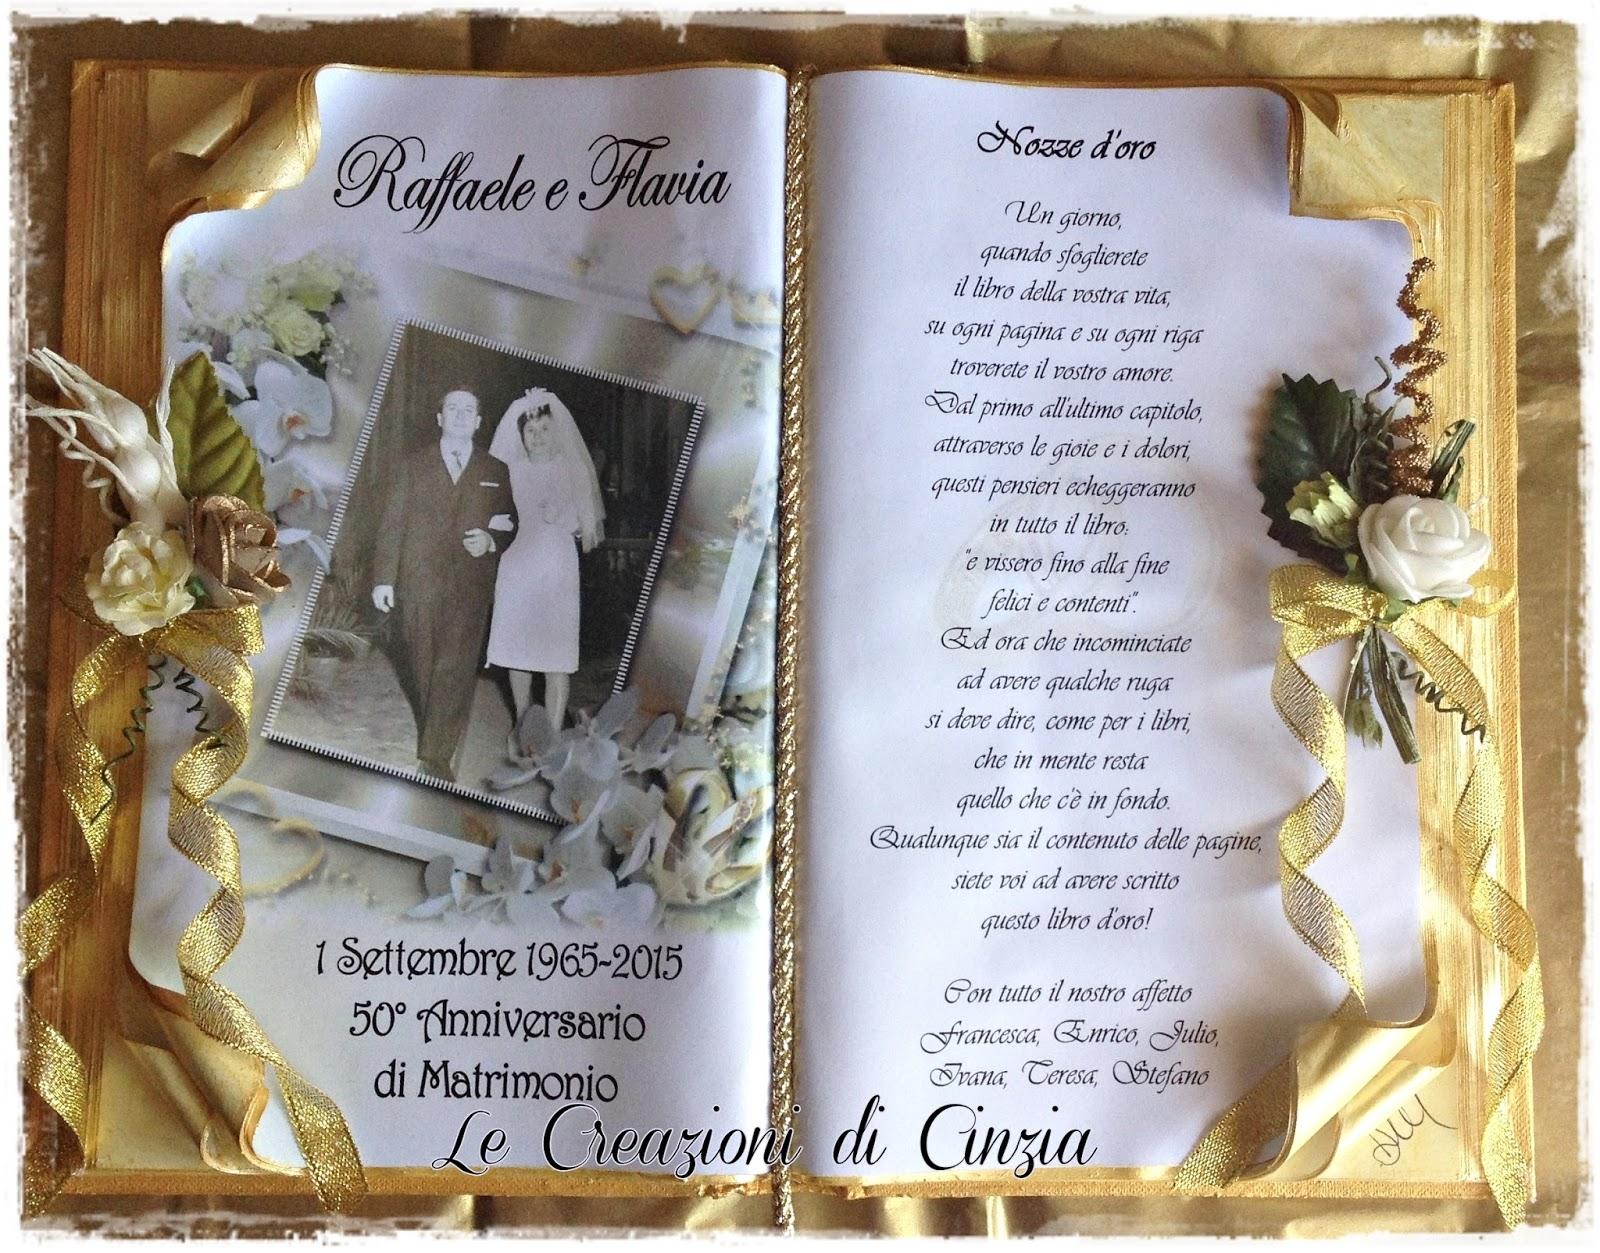 Frasi Matrimonio Yahoo.4570book Clipart Nozze Doro Regalo In Pack 4700